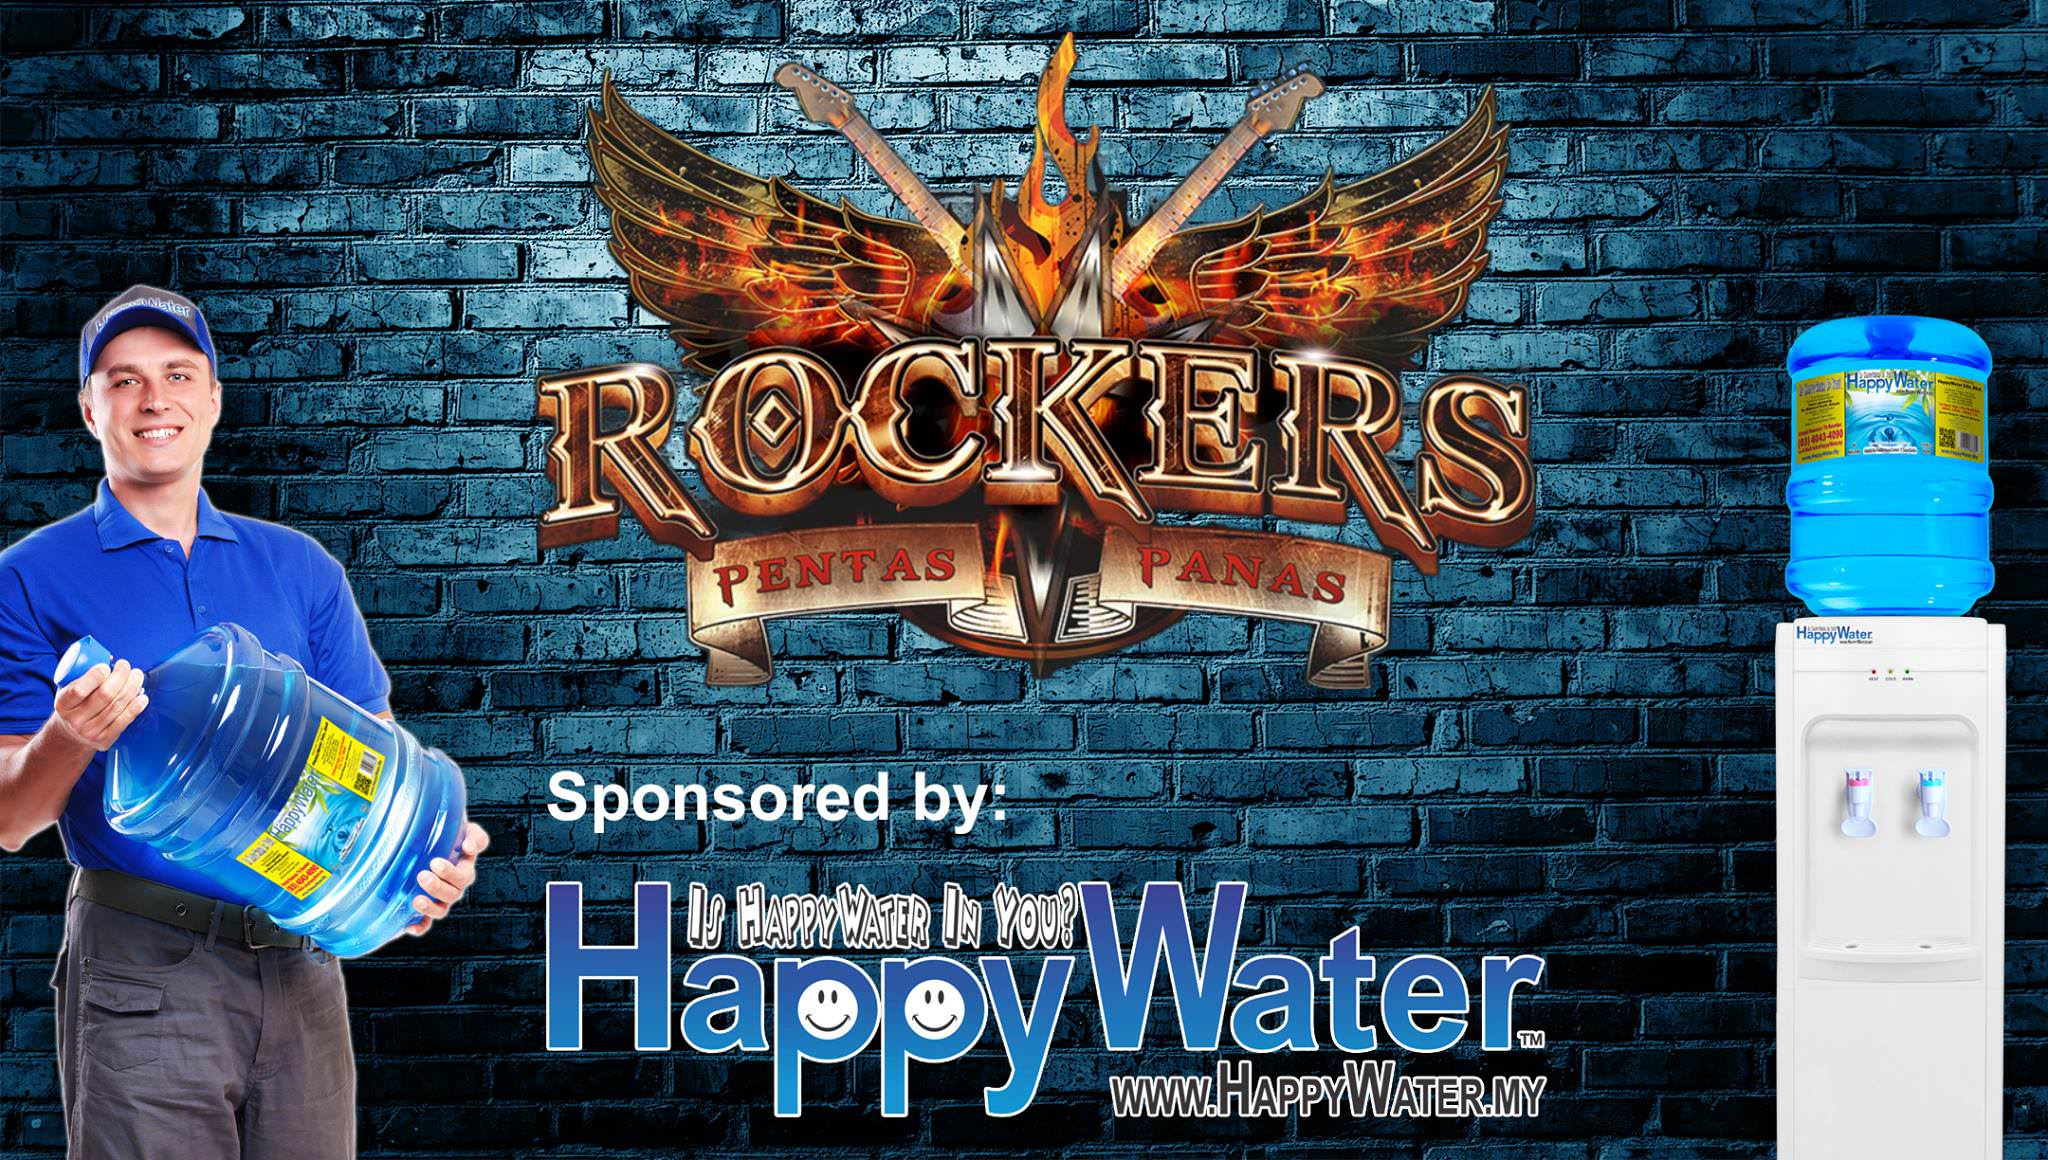 Rockers Pentas Panas reality talent show